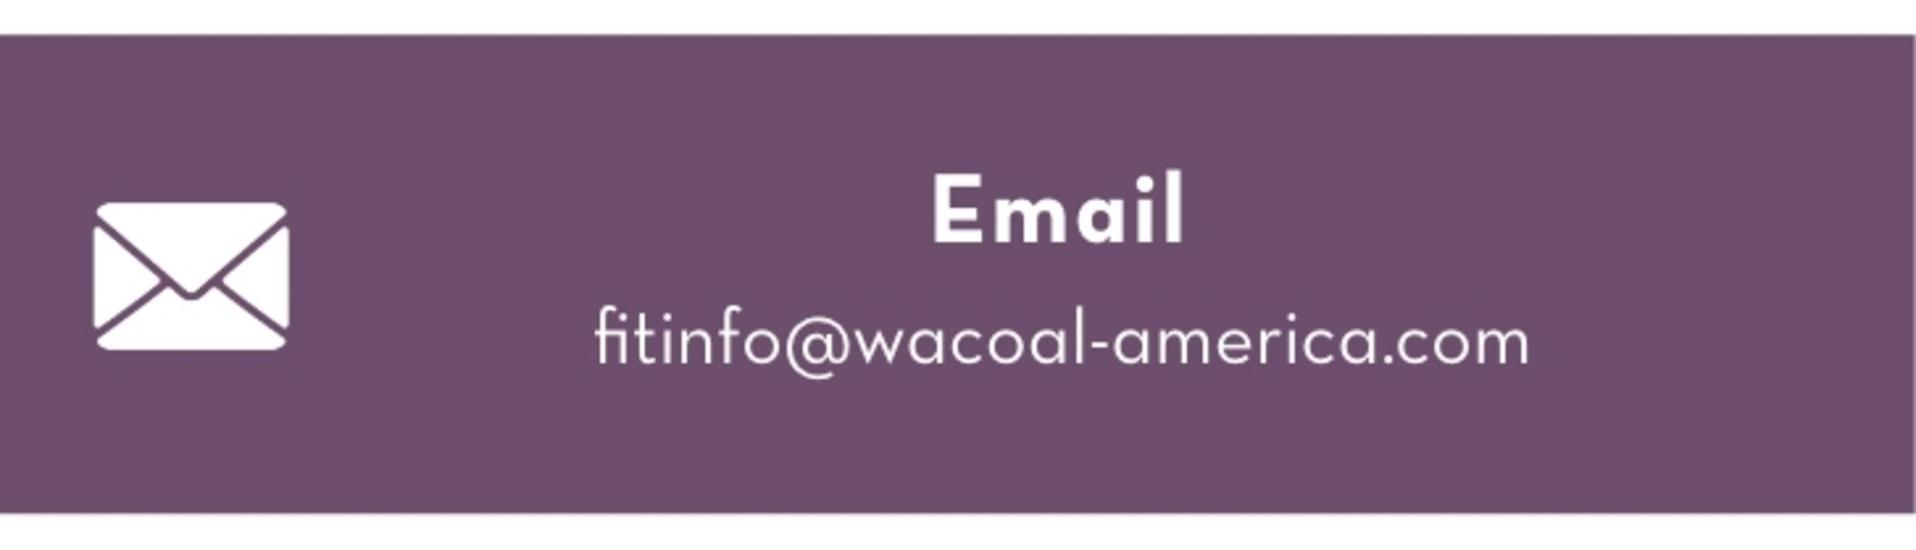 Email: fitinfo@wacoal-america.com